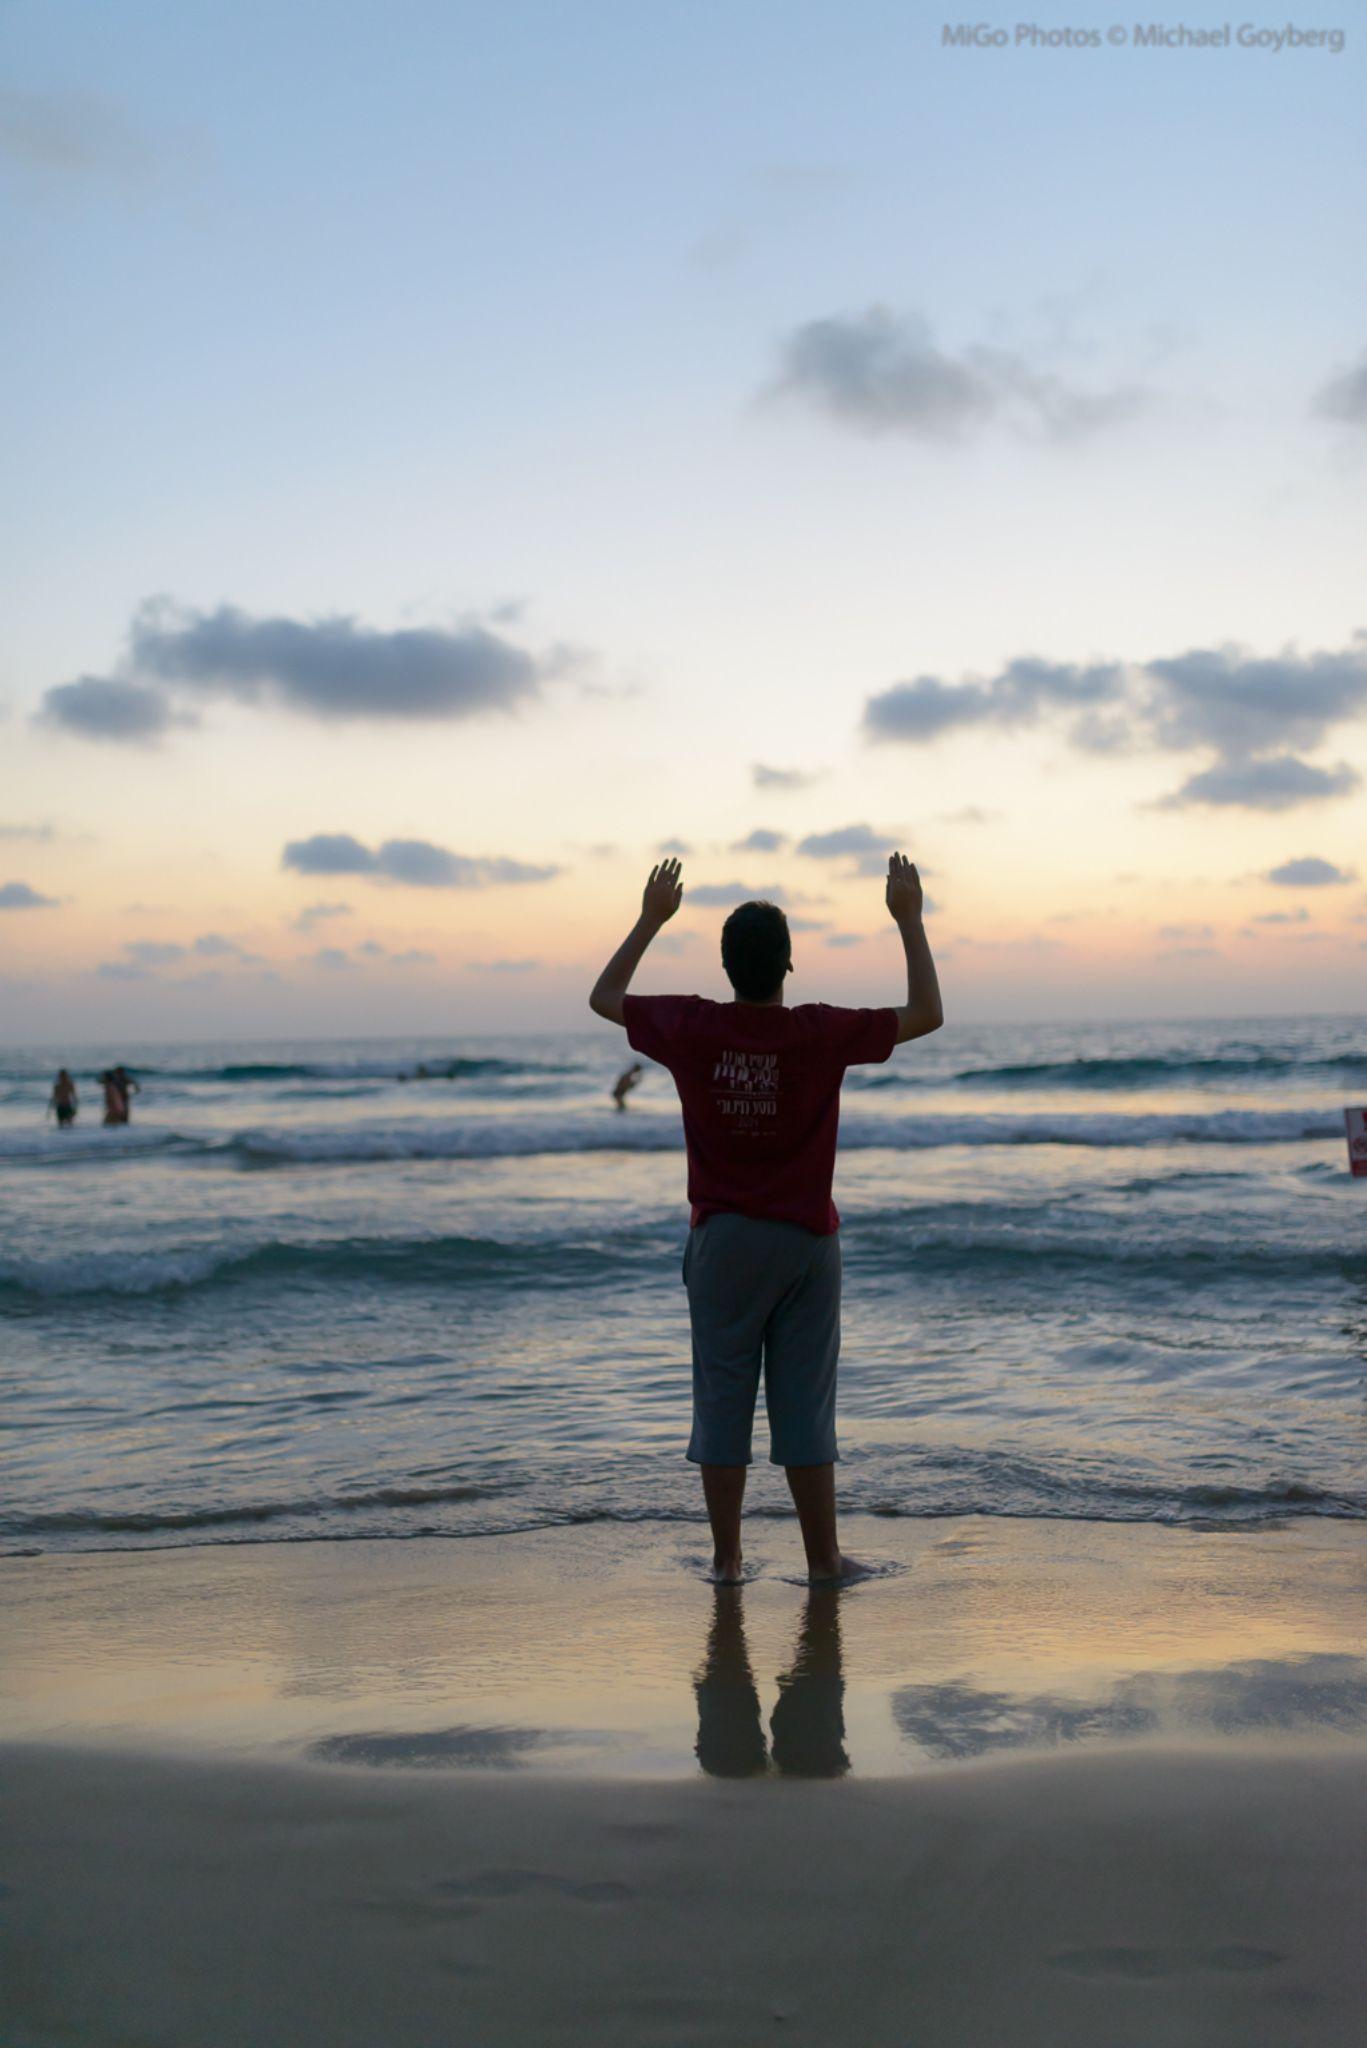 Goodbye sun, Goodbye! by Michael Goyberg